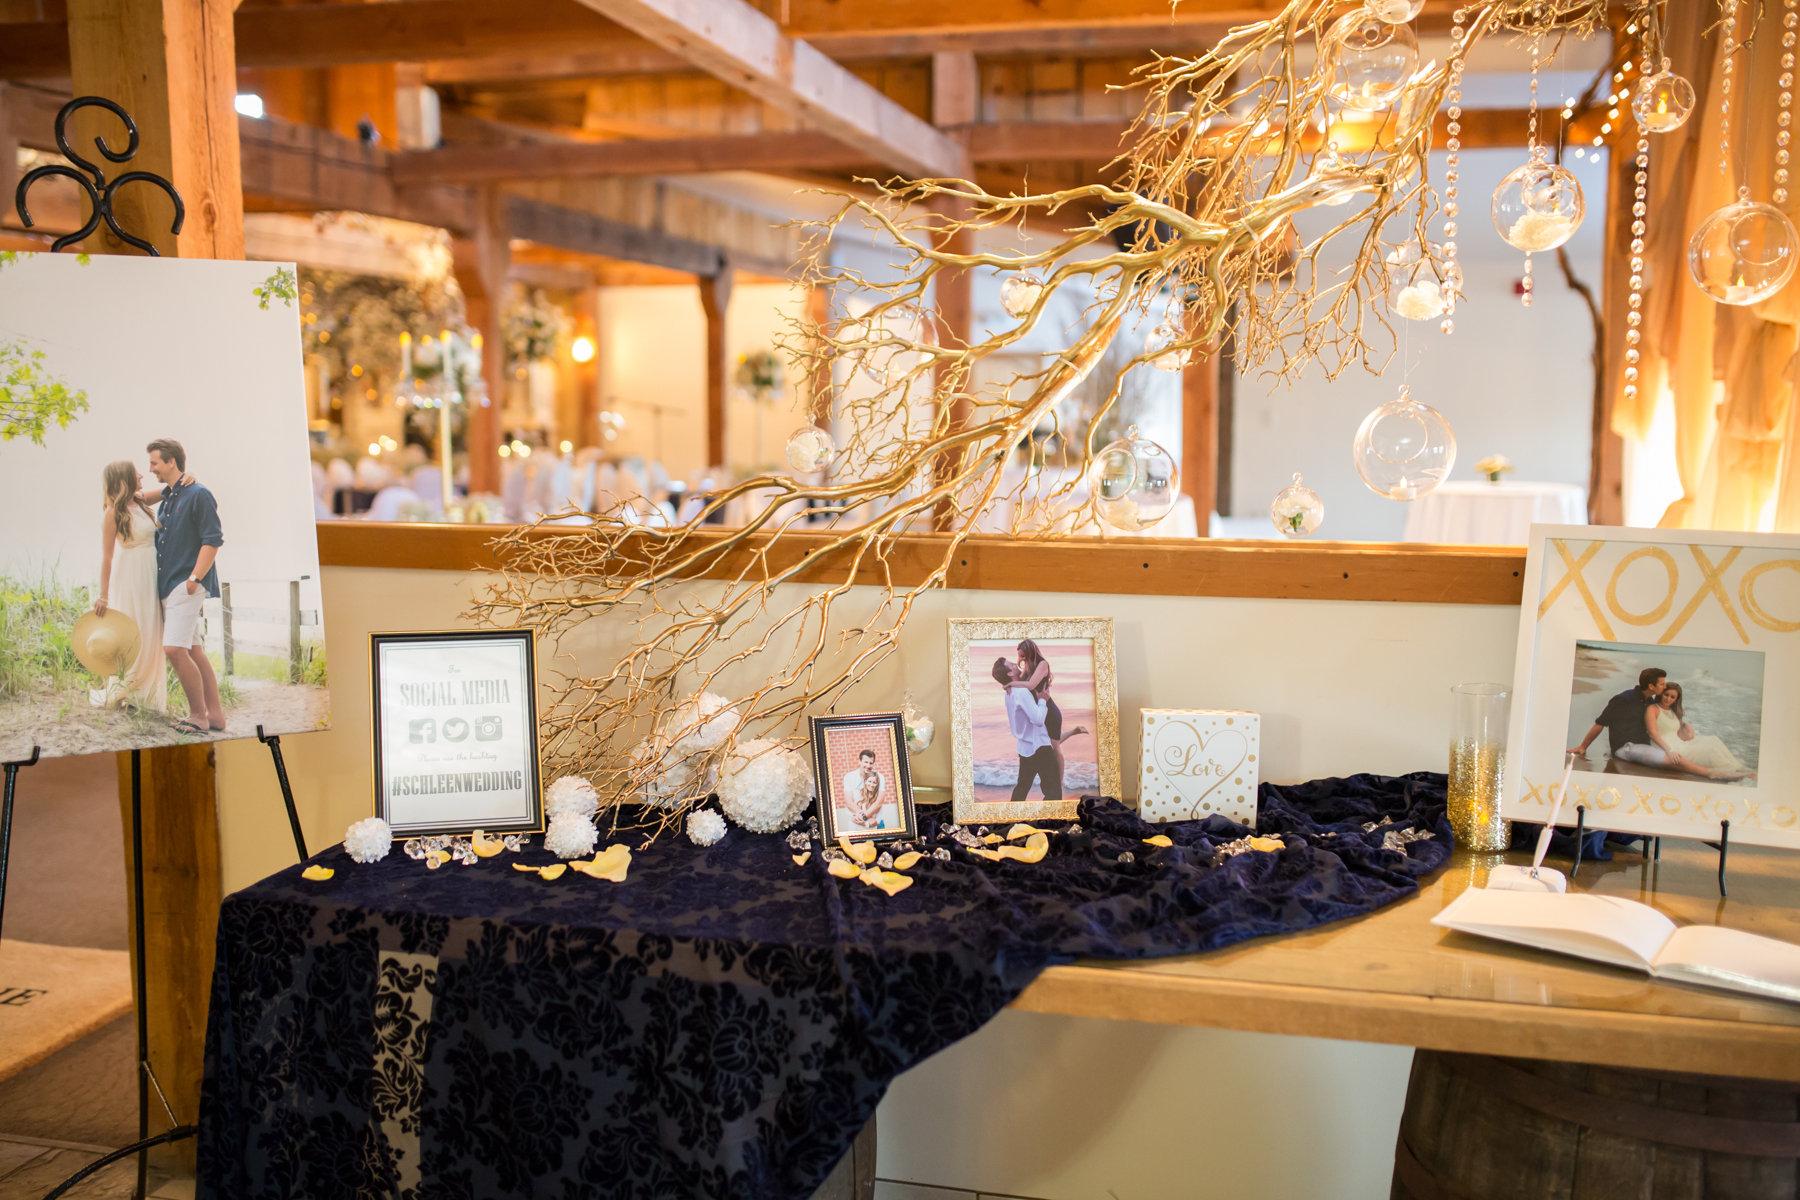 Bellamere Winery London Ontario Wedding Venue 183 Bellamere Winery Amp Event Centre